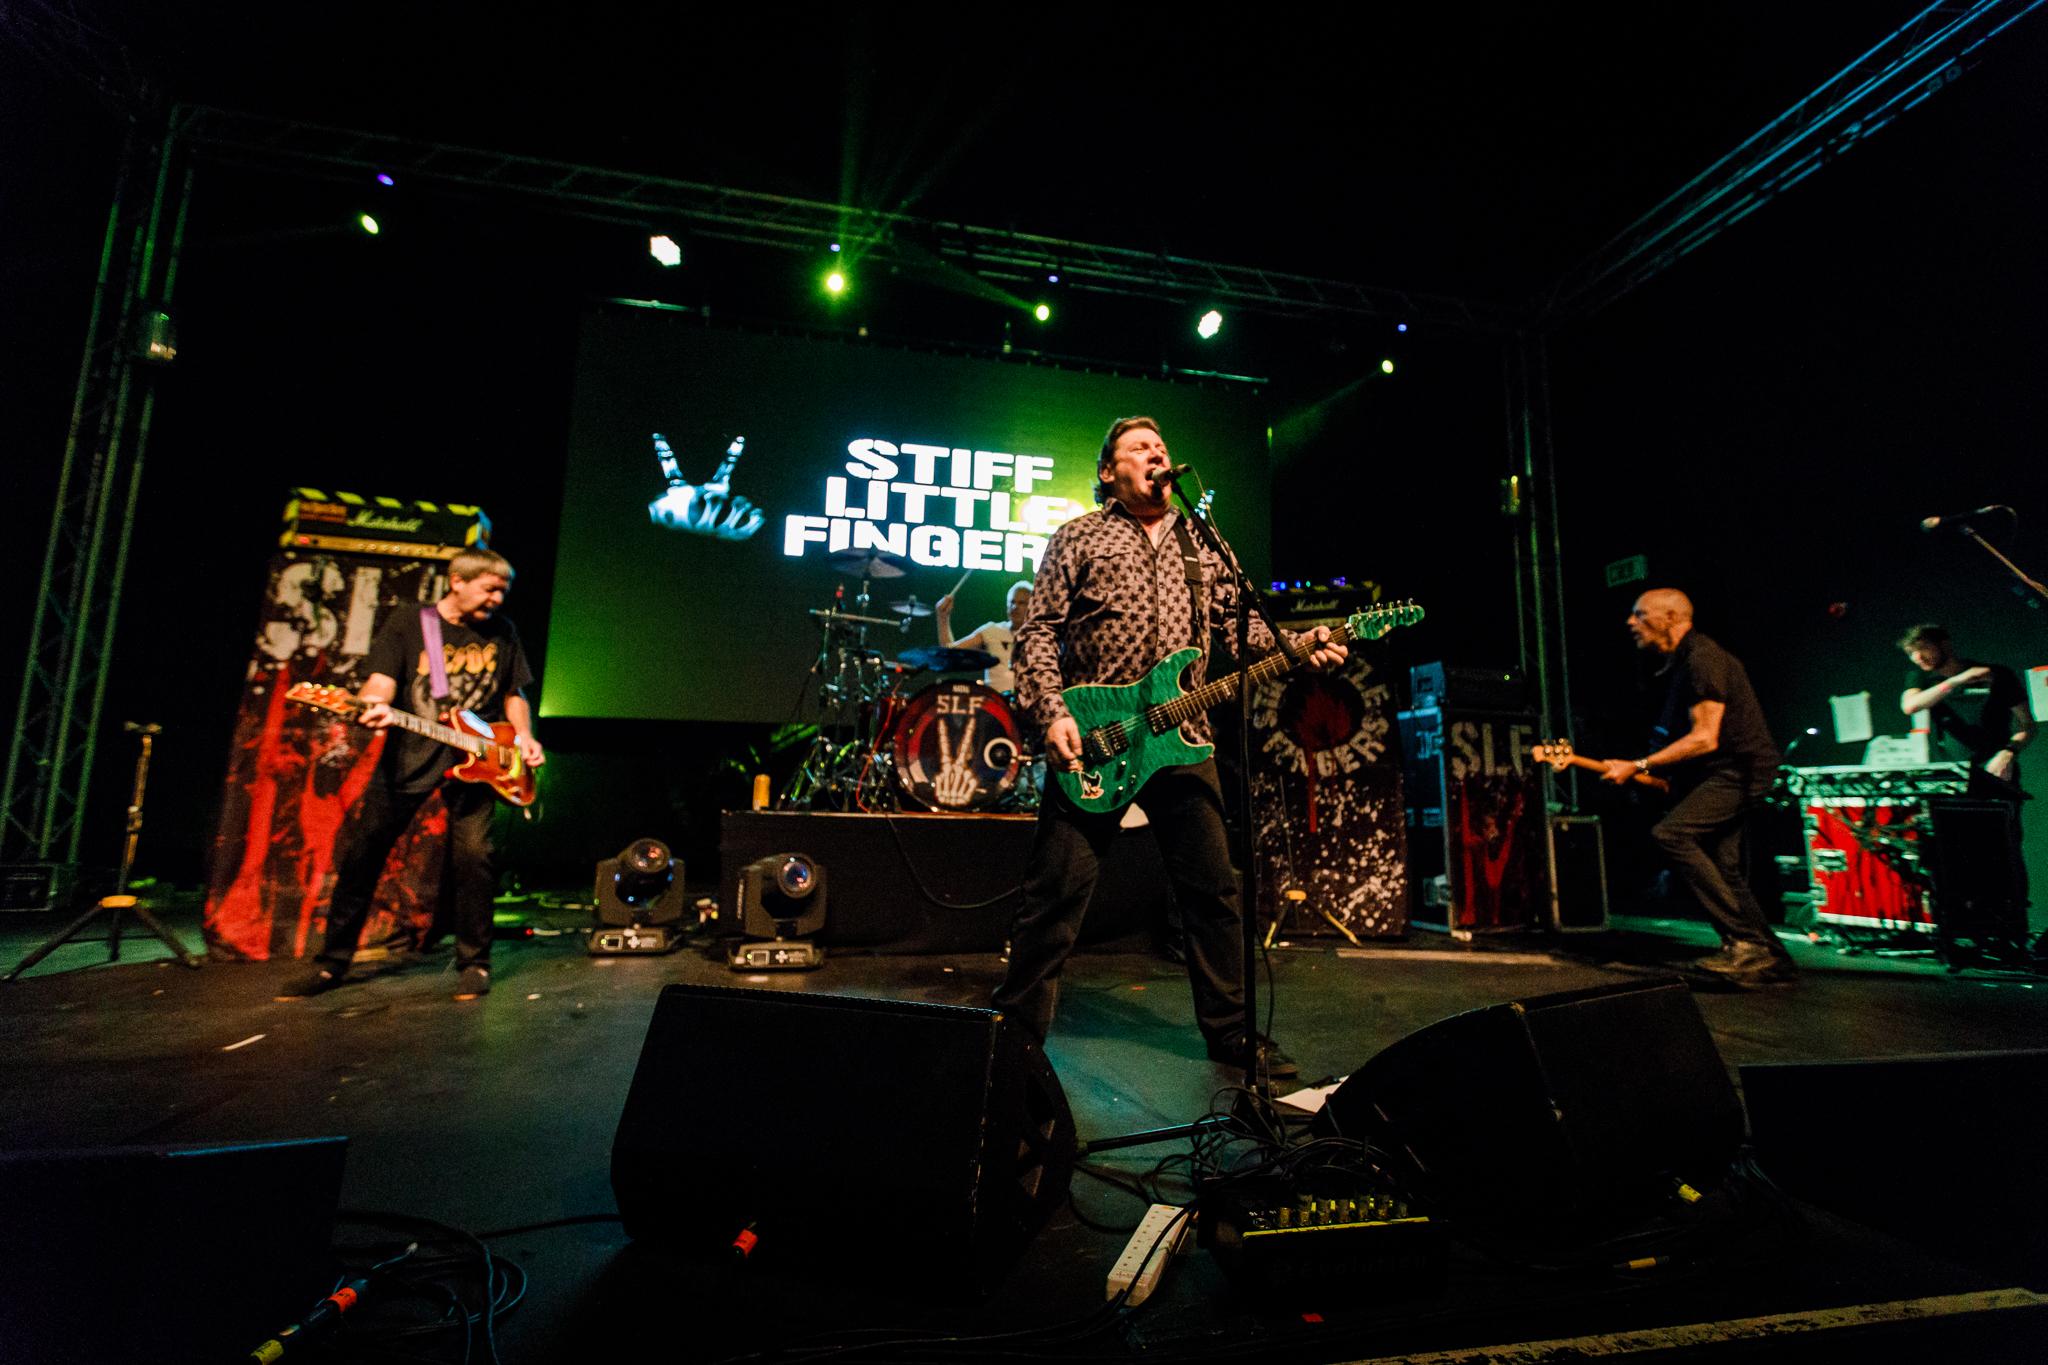 Stiff Little Fingers performing at The Forum Hertfordshire in Hatfield, England - 5/26/2018 (photo by Matt Condon / @arcane93)